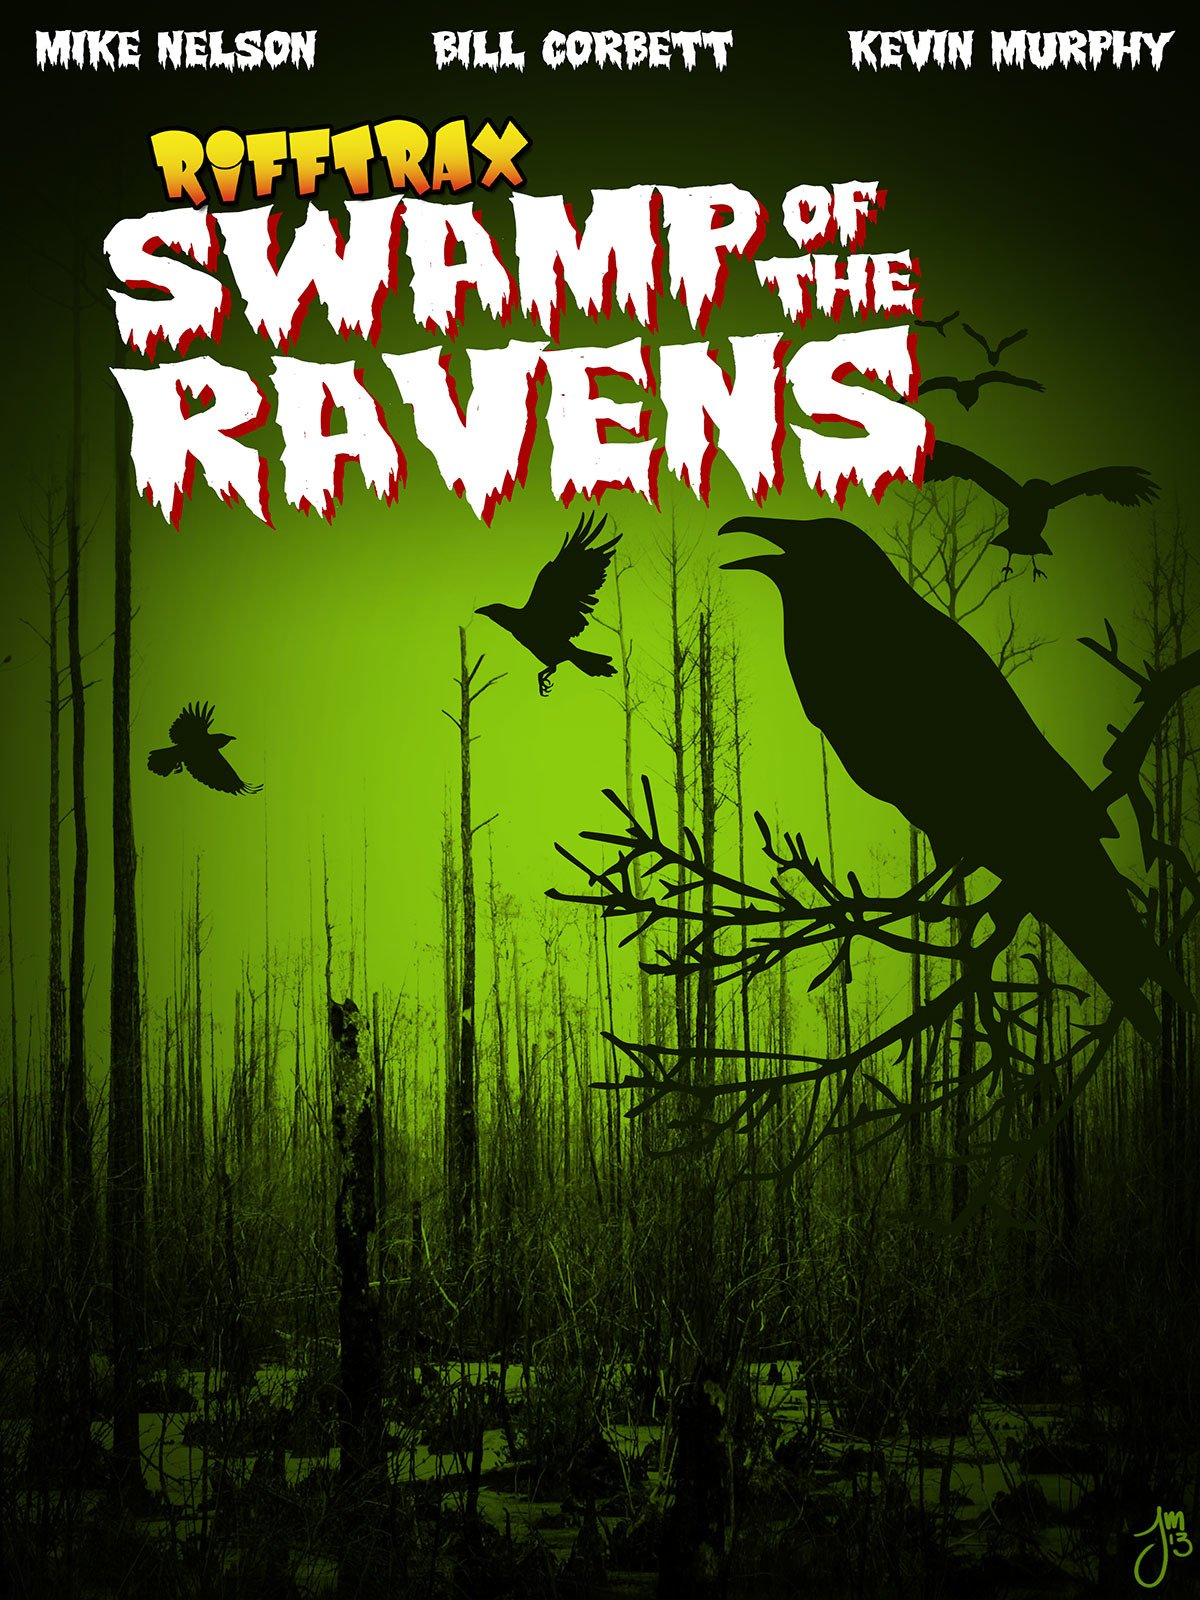 RiffTrax: Swamp of the Ravens